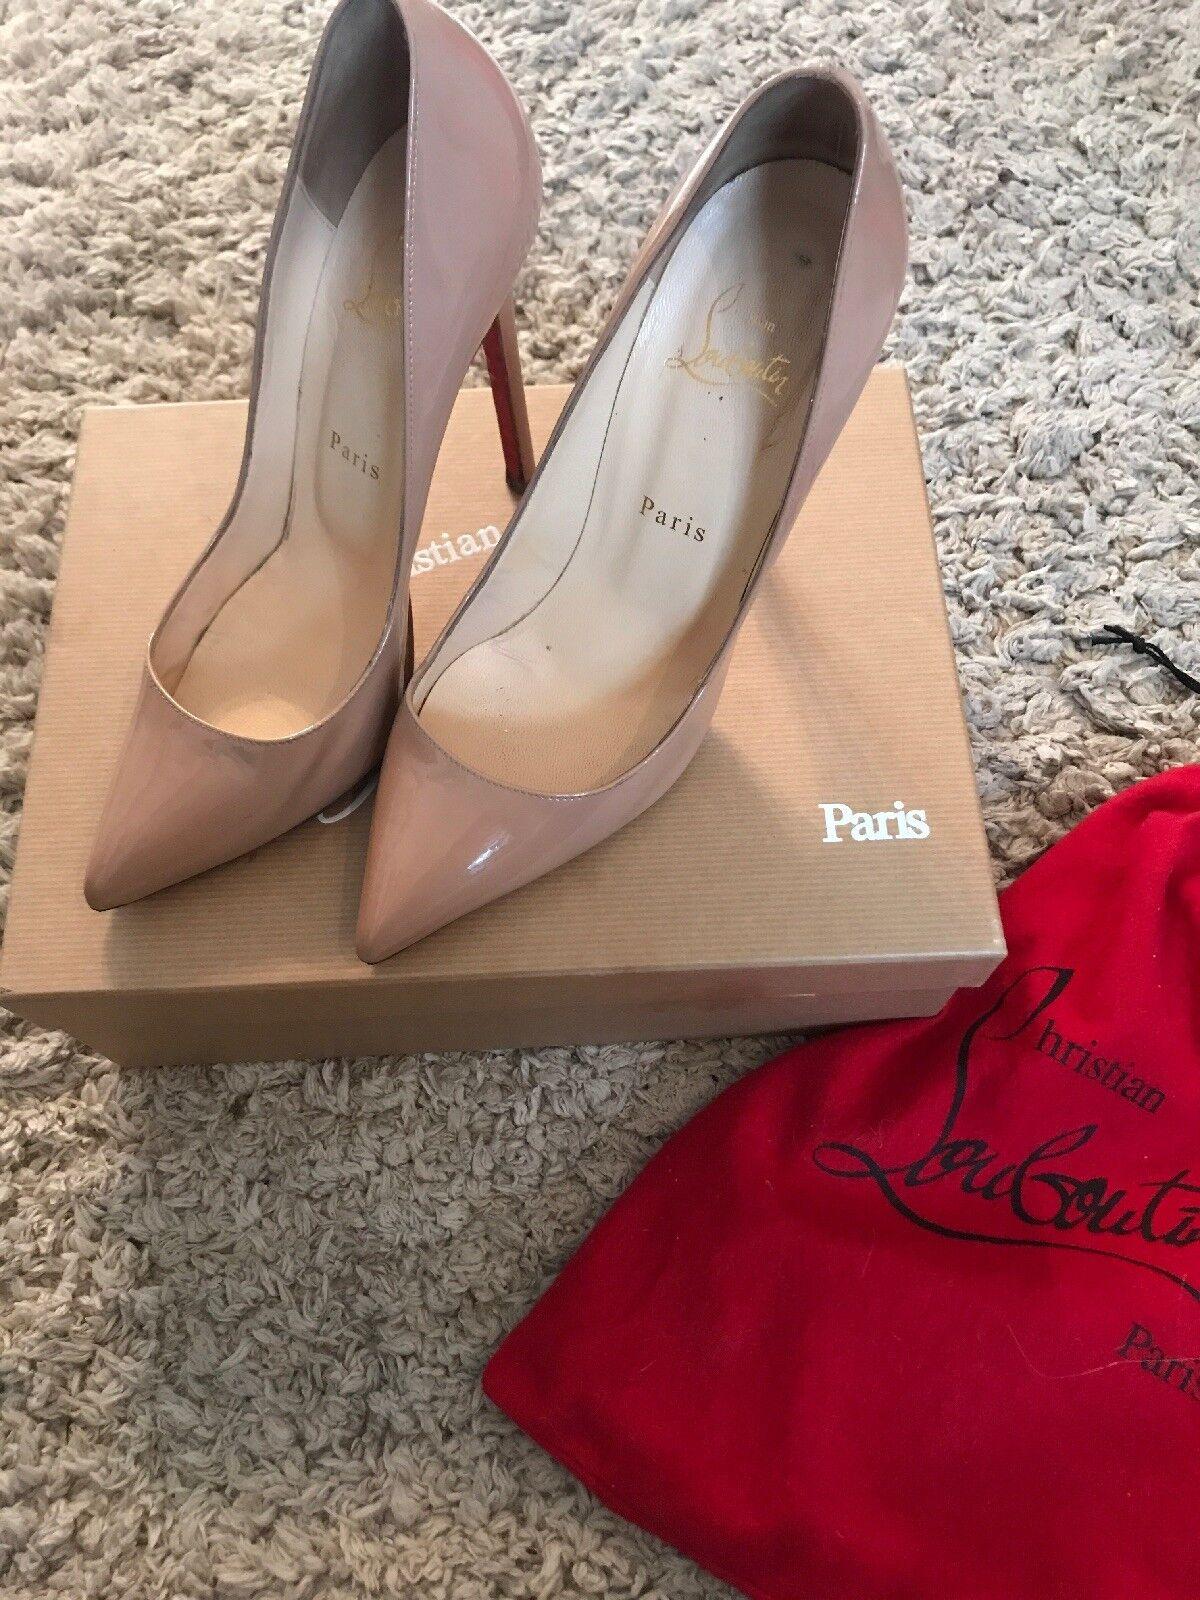 Christian louboutin shoes size 38